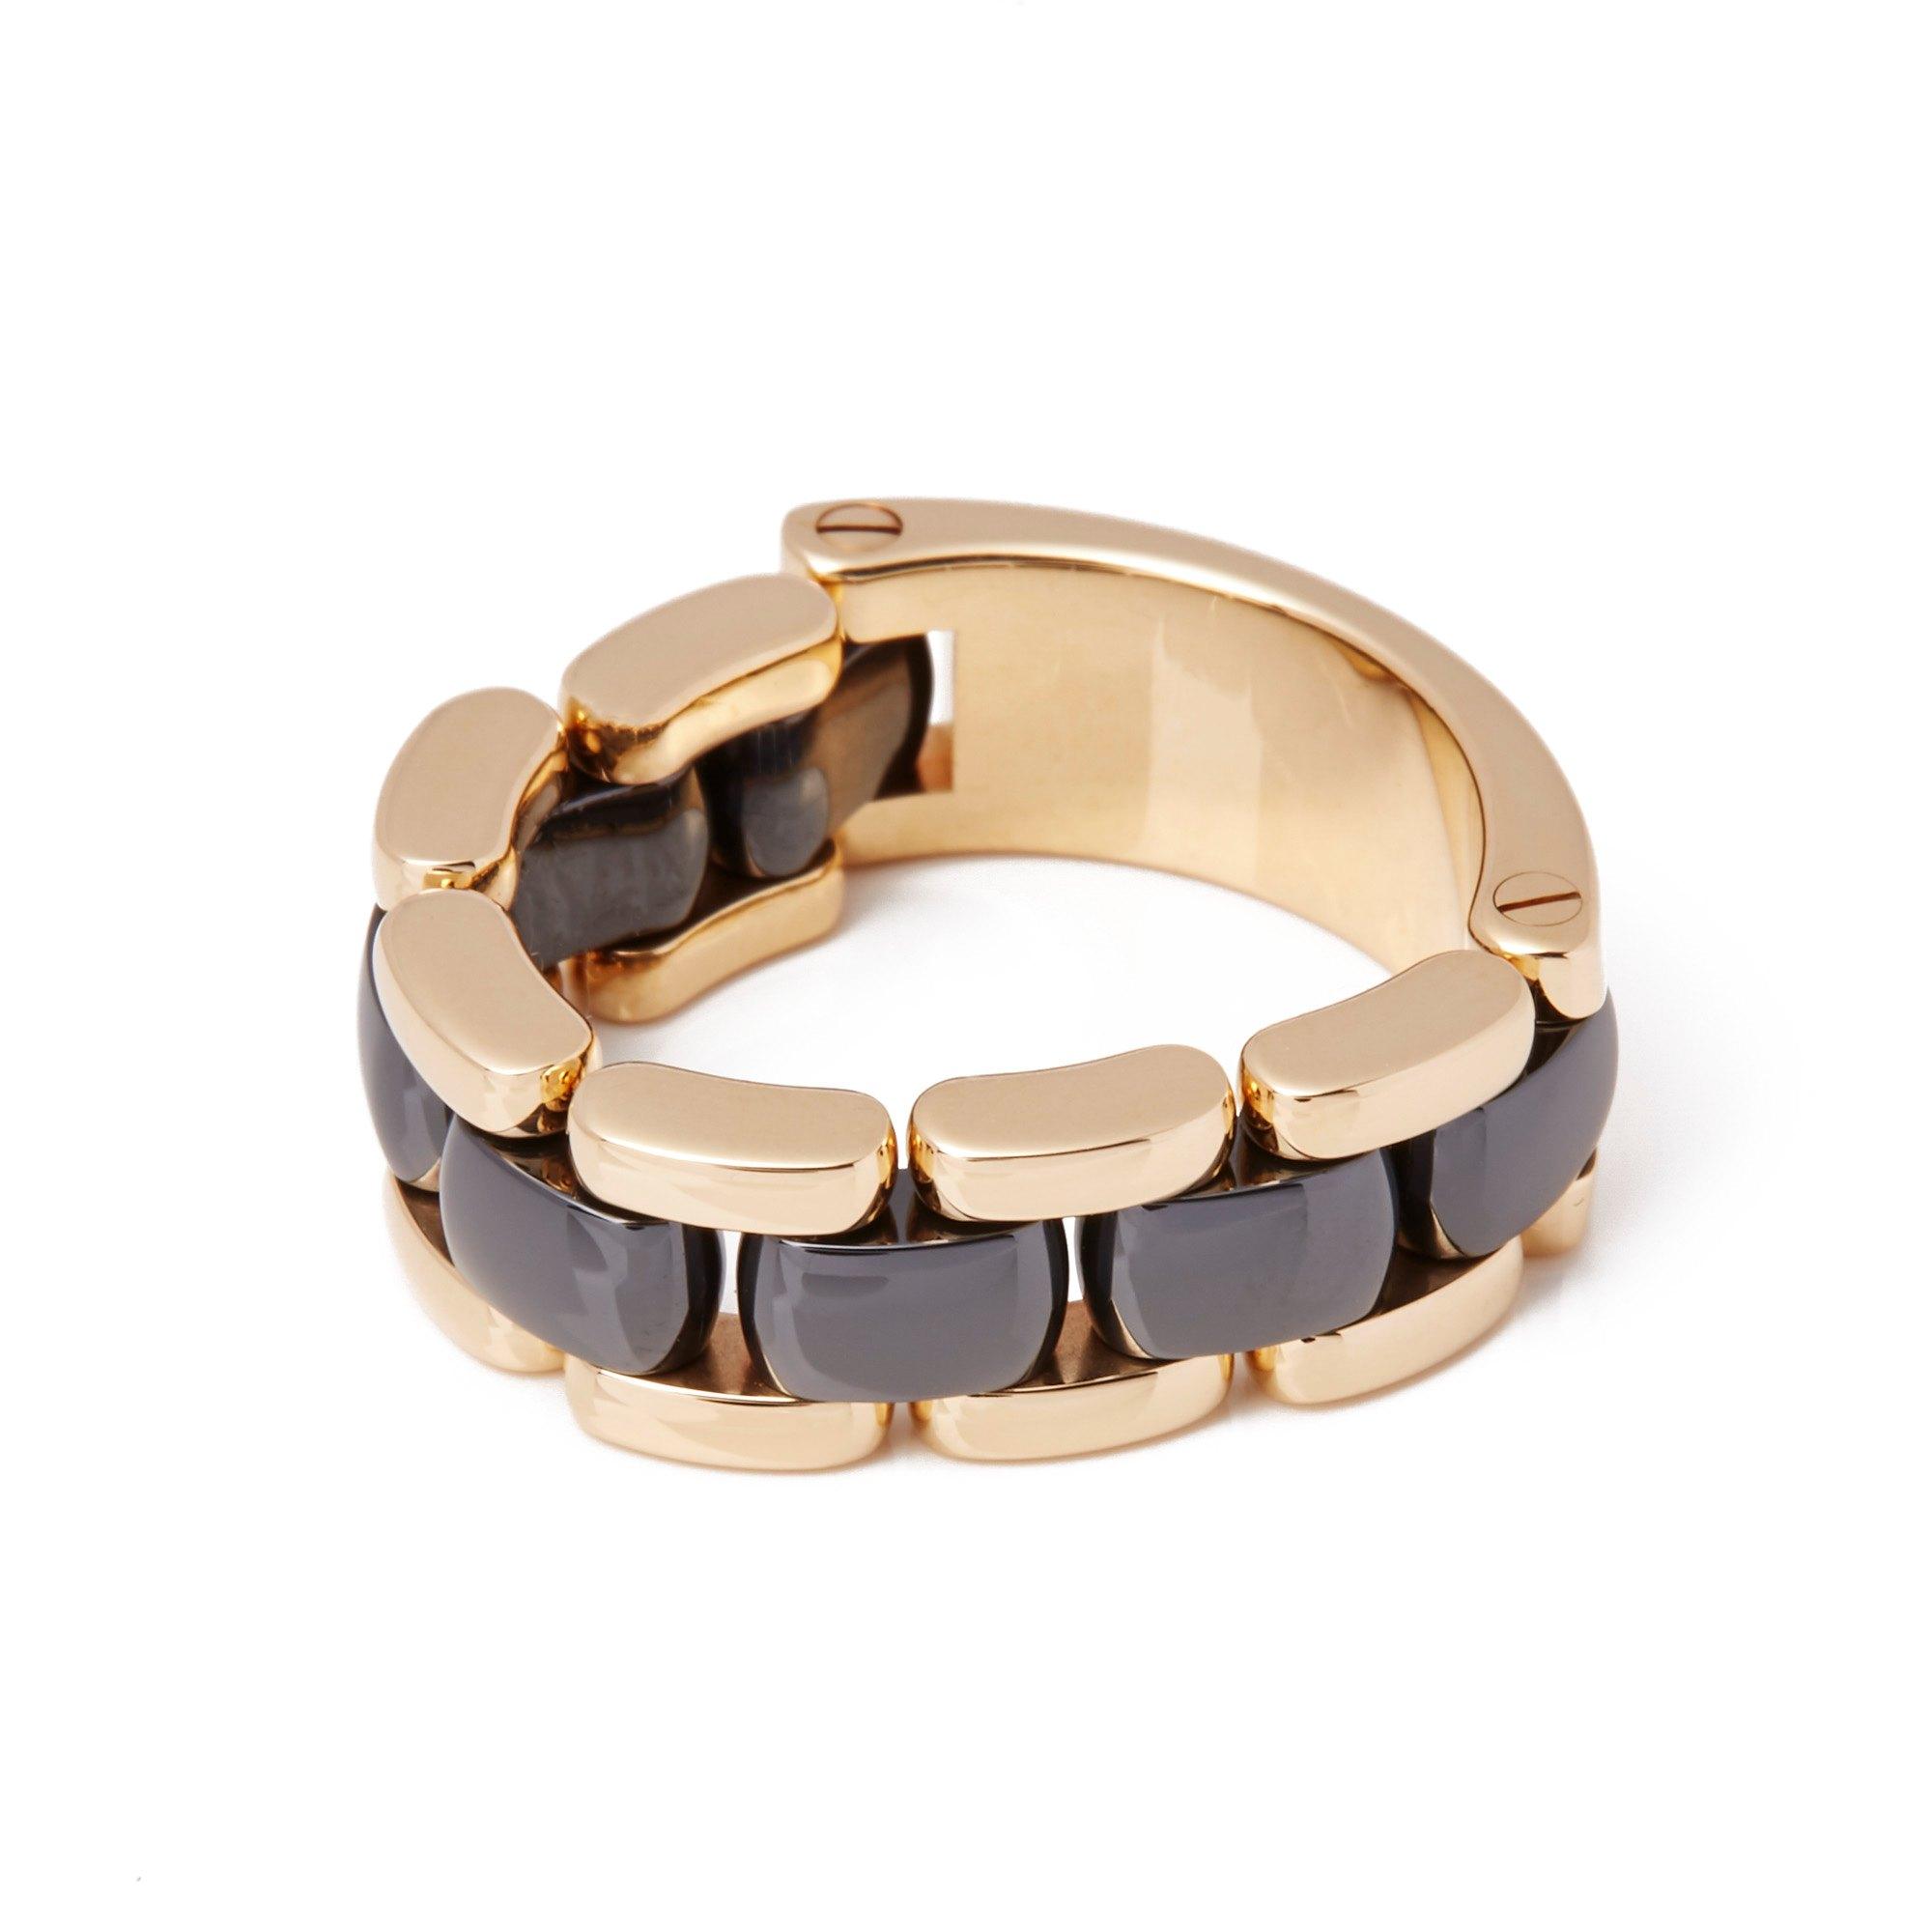 Chanel 18ct Yellow Gold Hematite Ultra Ring